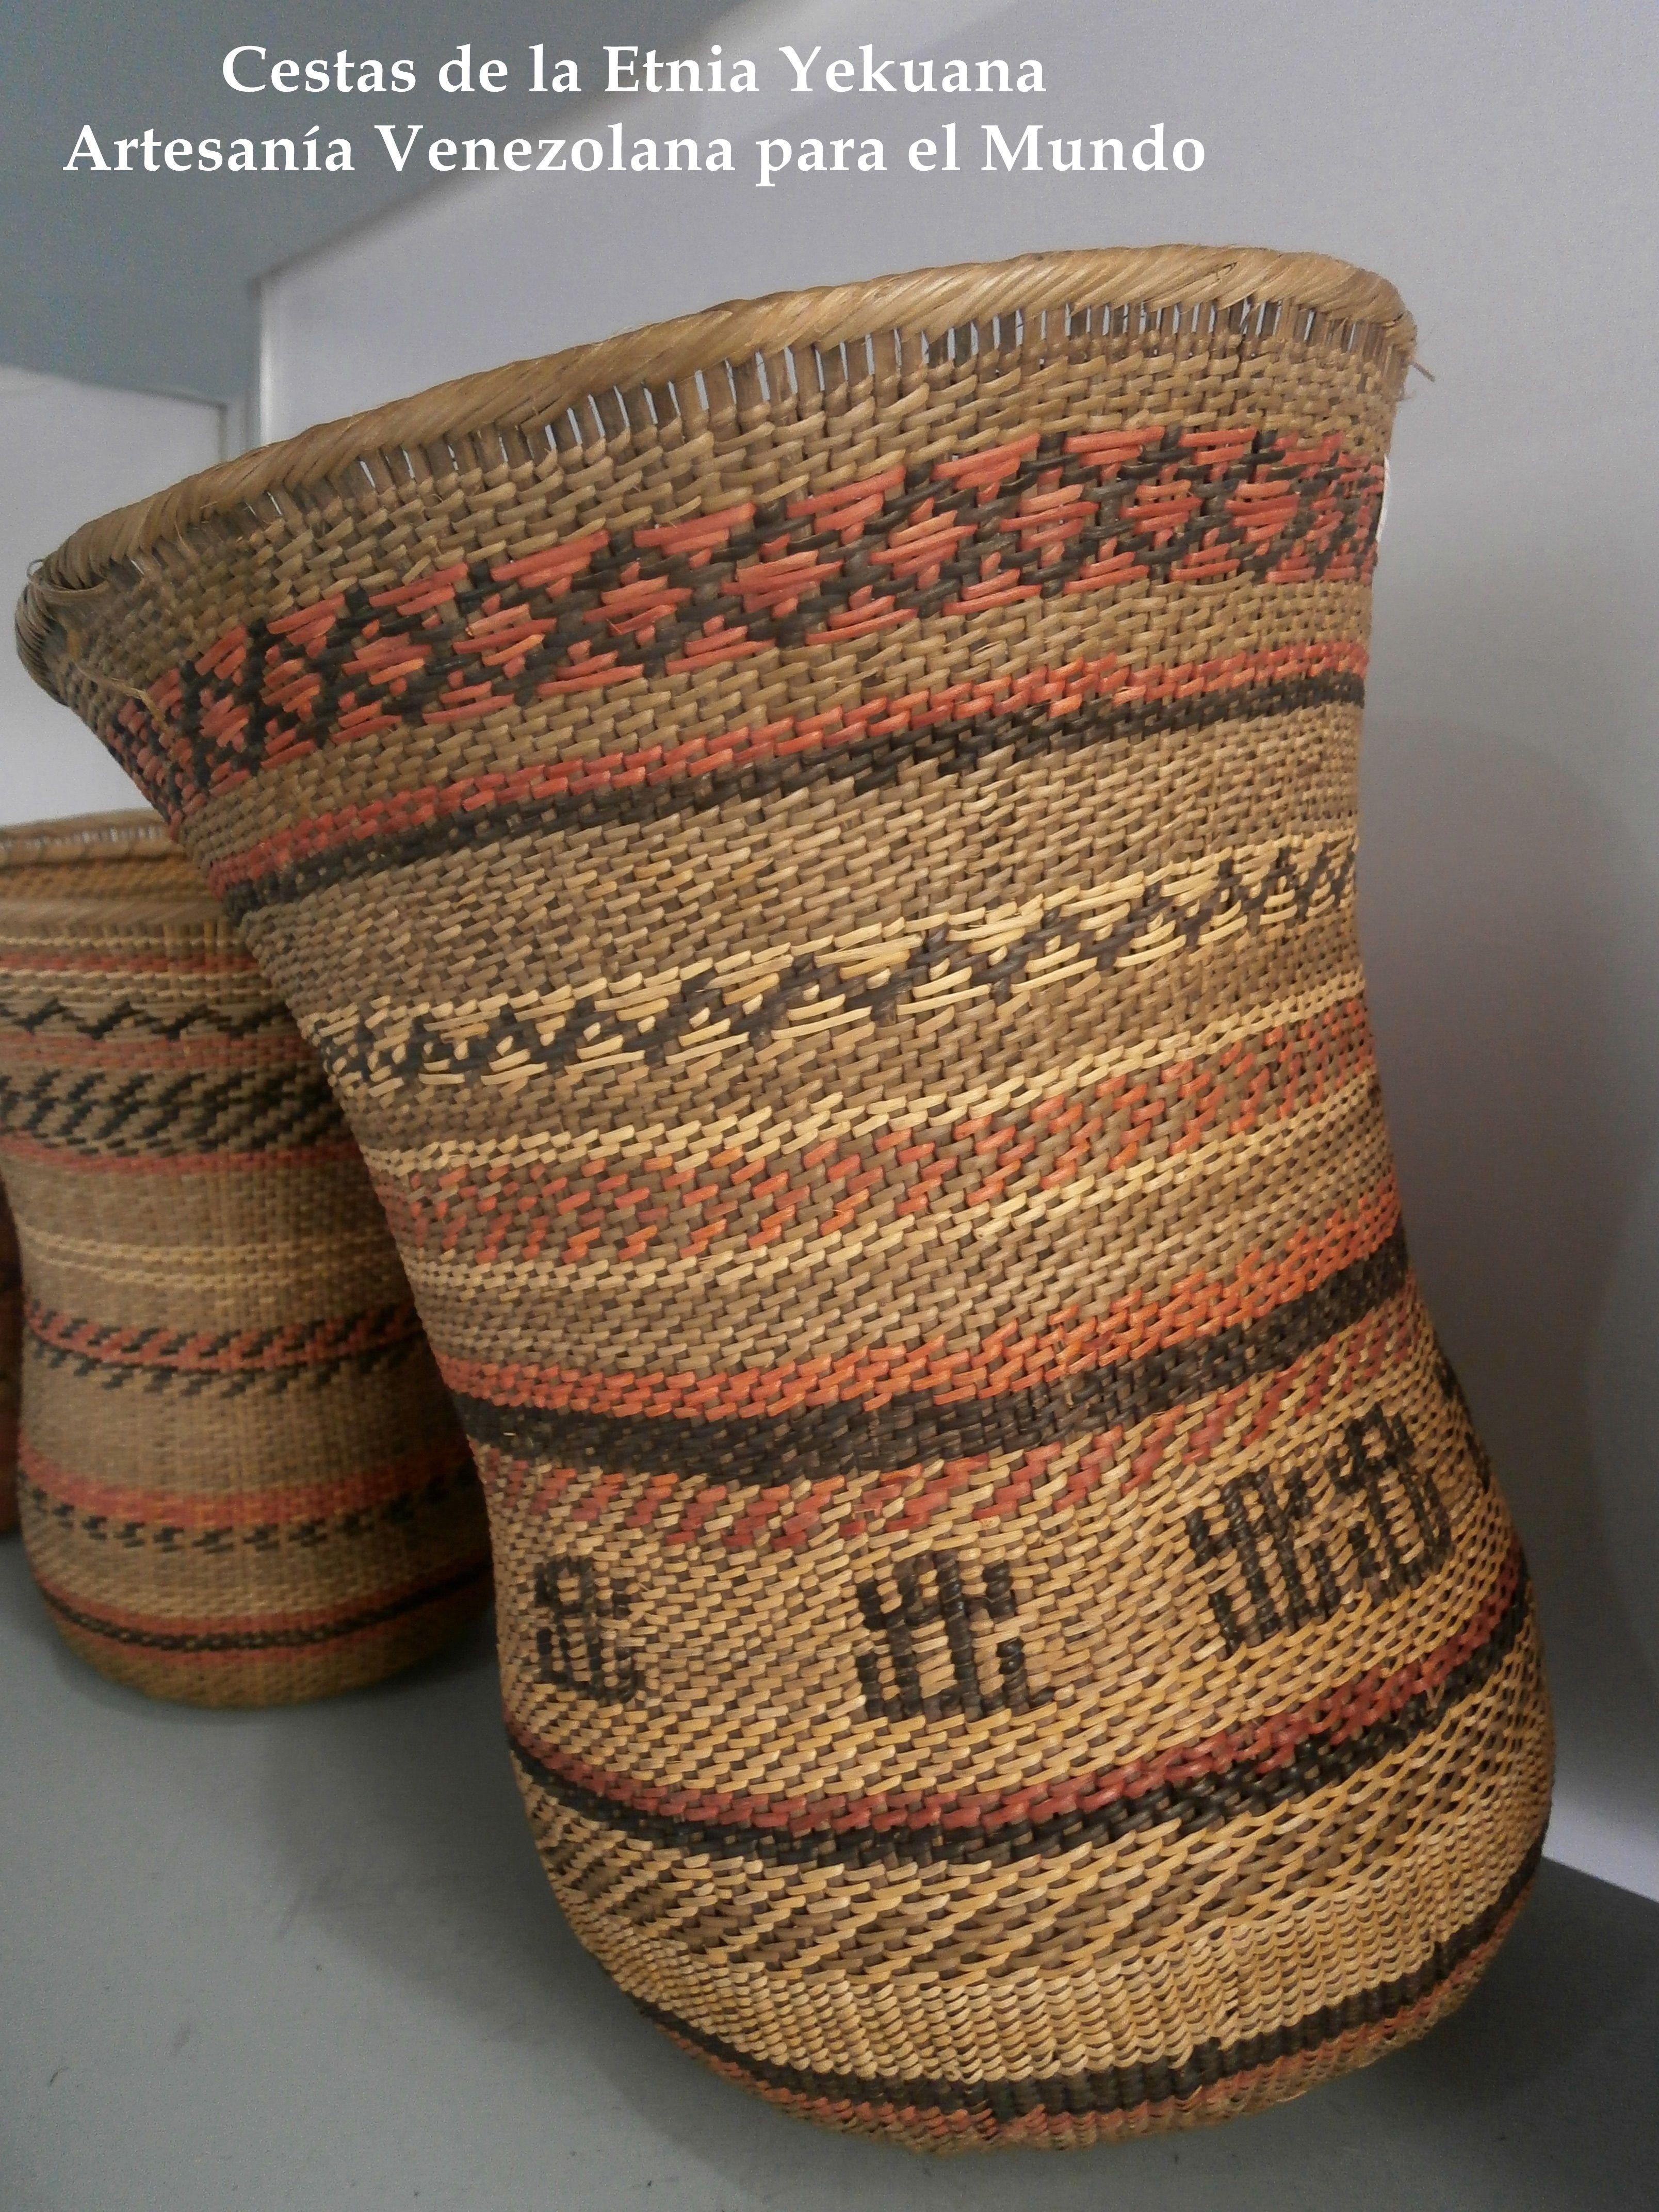 Cesta Etnia Yekuana En las cestas usan las siguientes técnicas ...